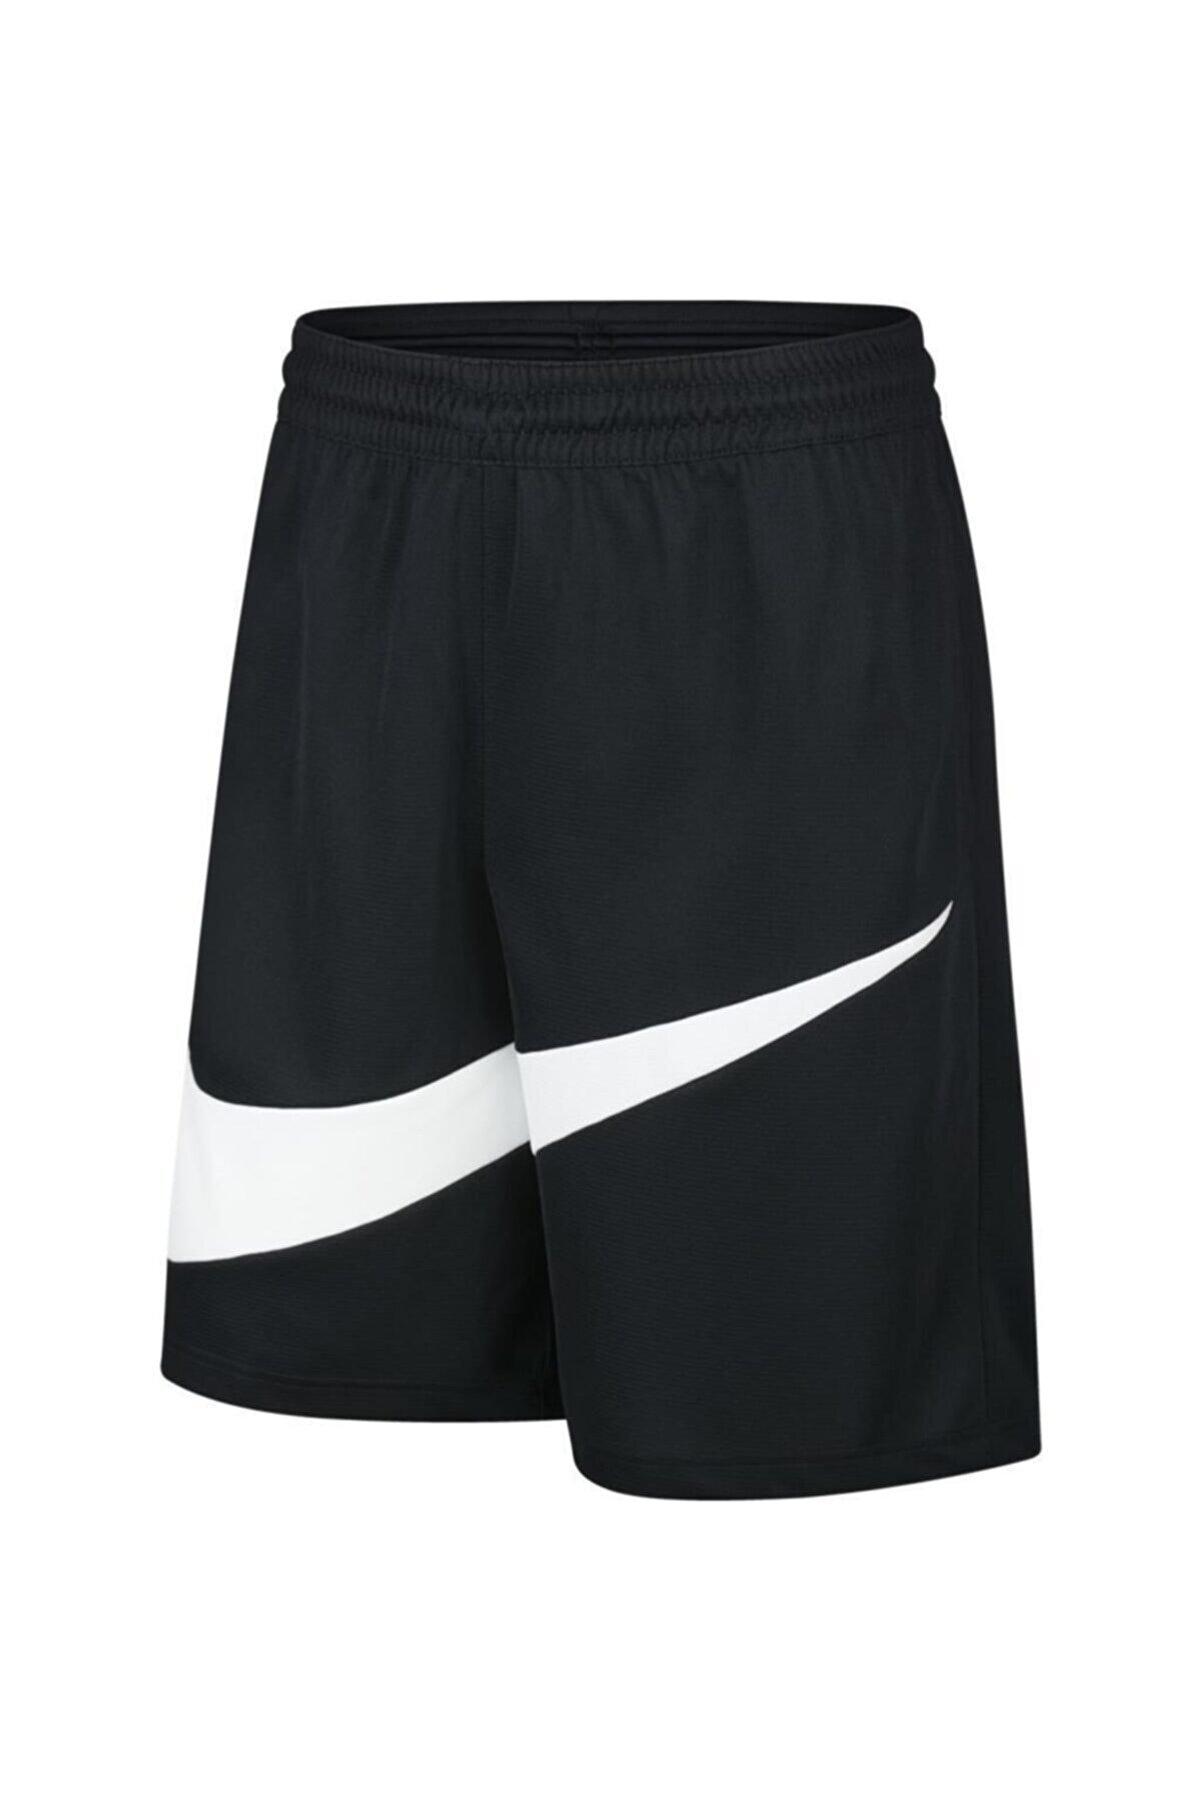 Nike Bv9385-011 M Nk Dry Hbr Short 2.0 Erkek Şort